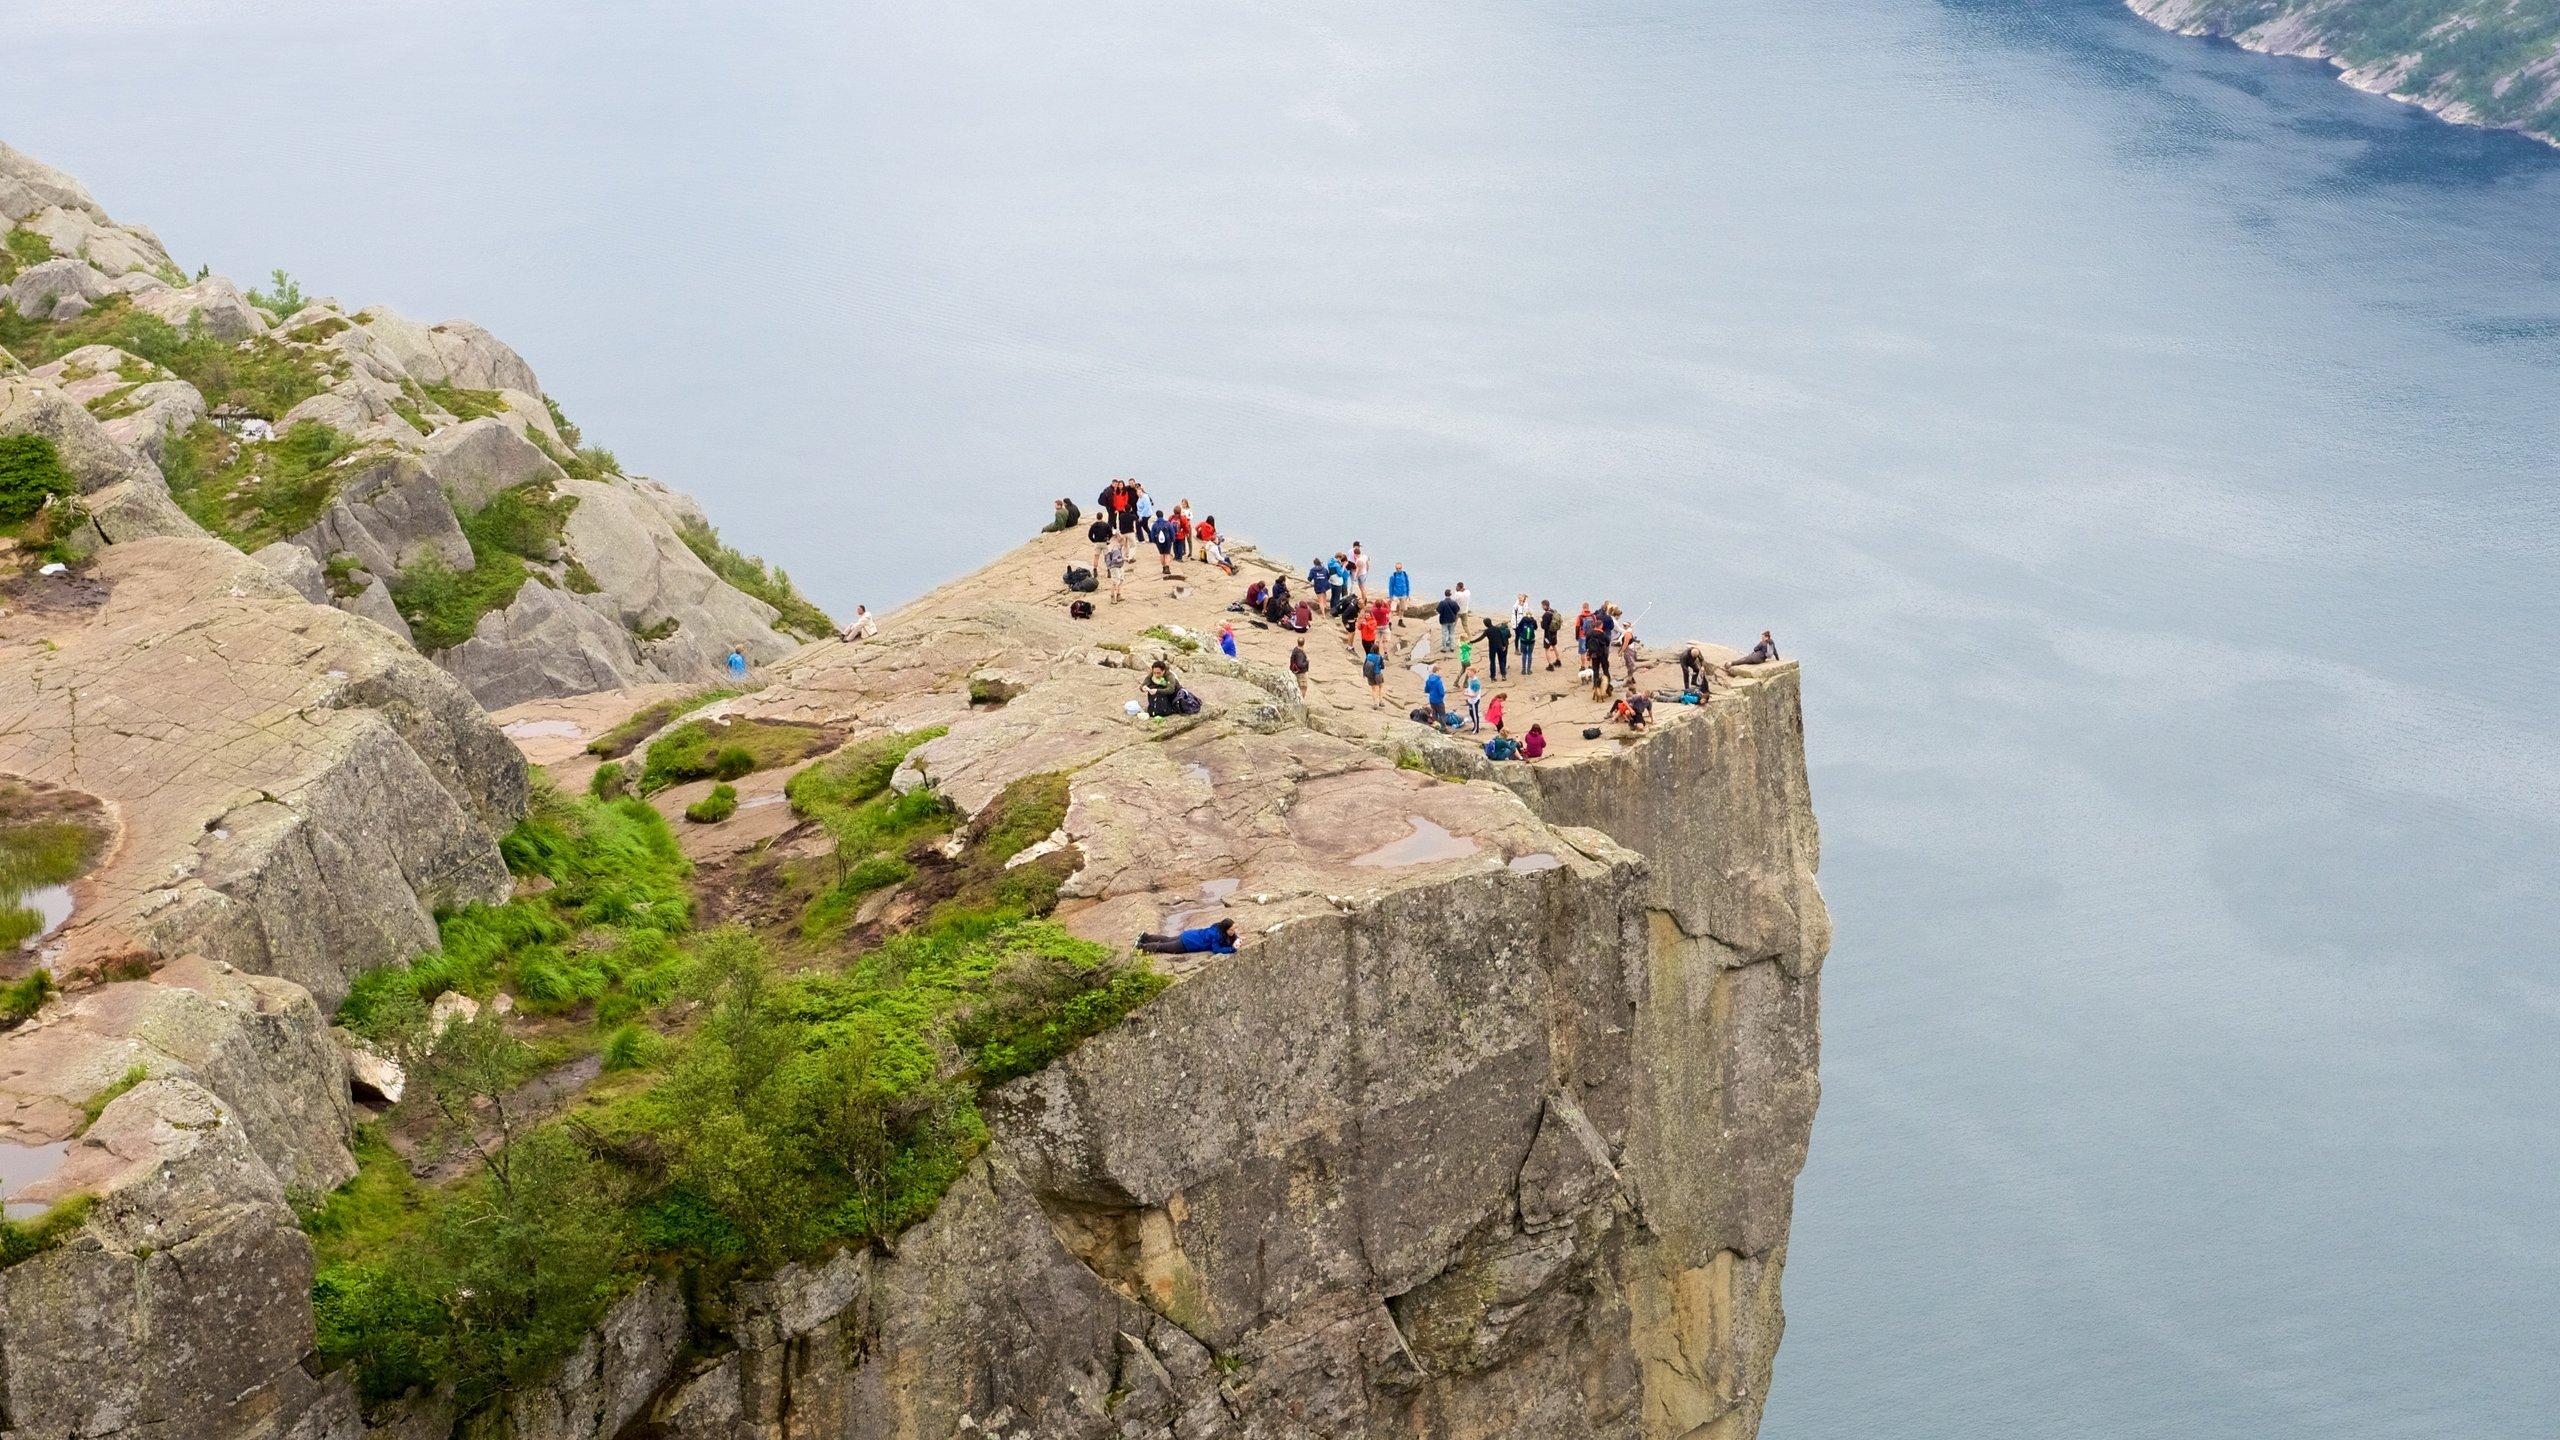 Preikestolen, Forsand, Rogaland, Norway